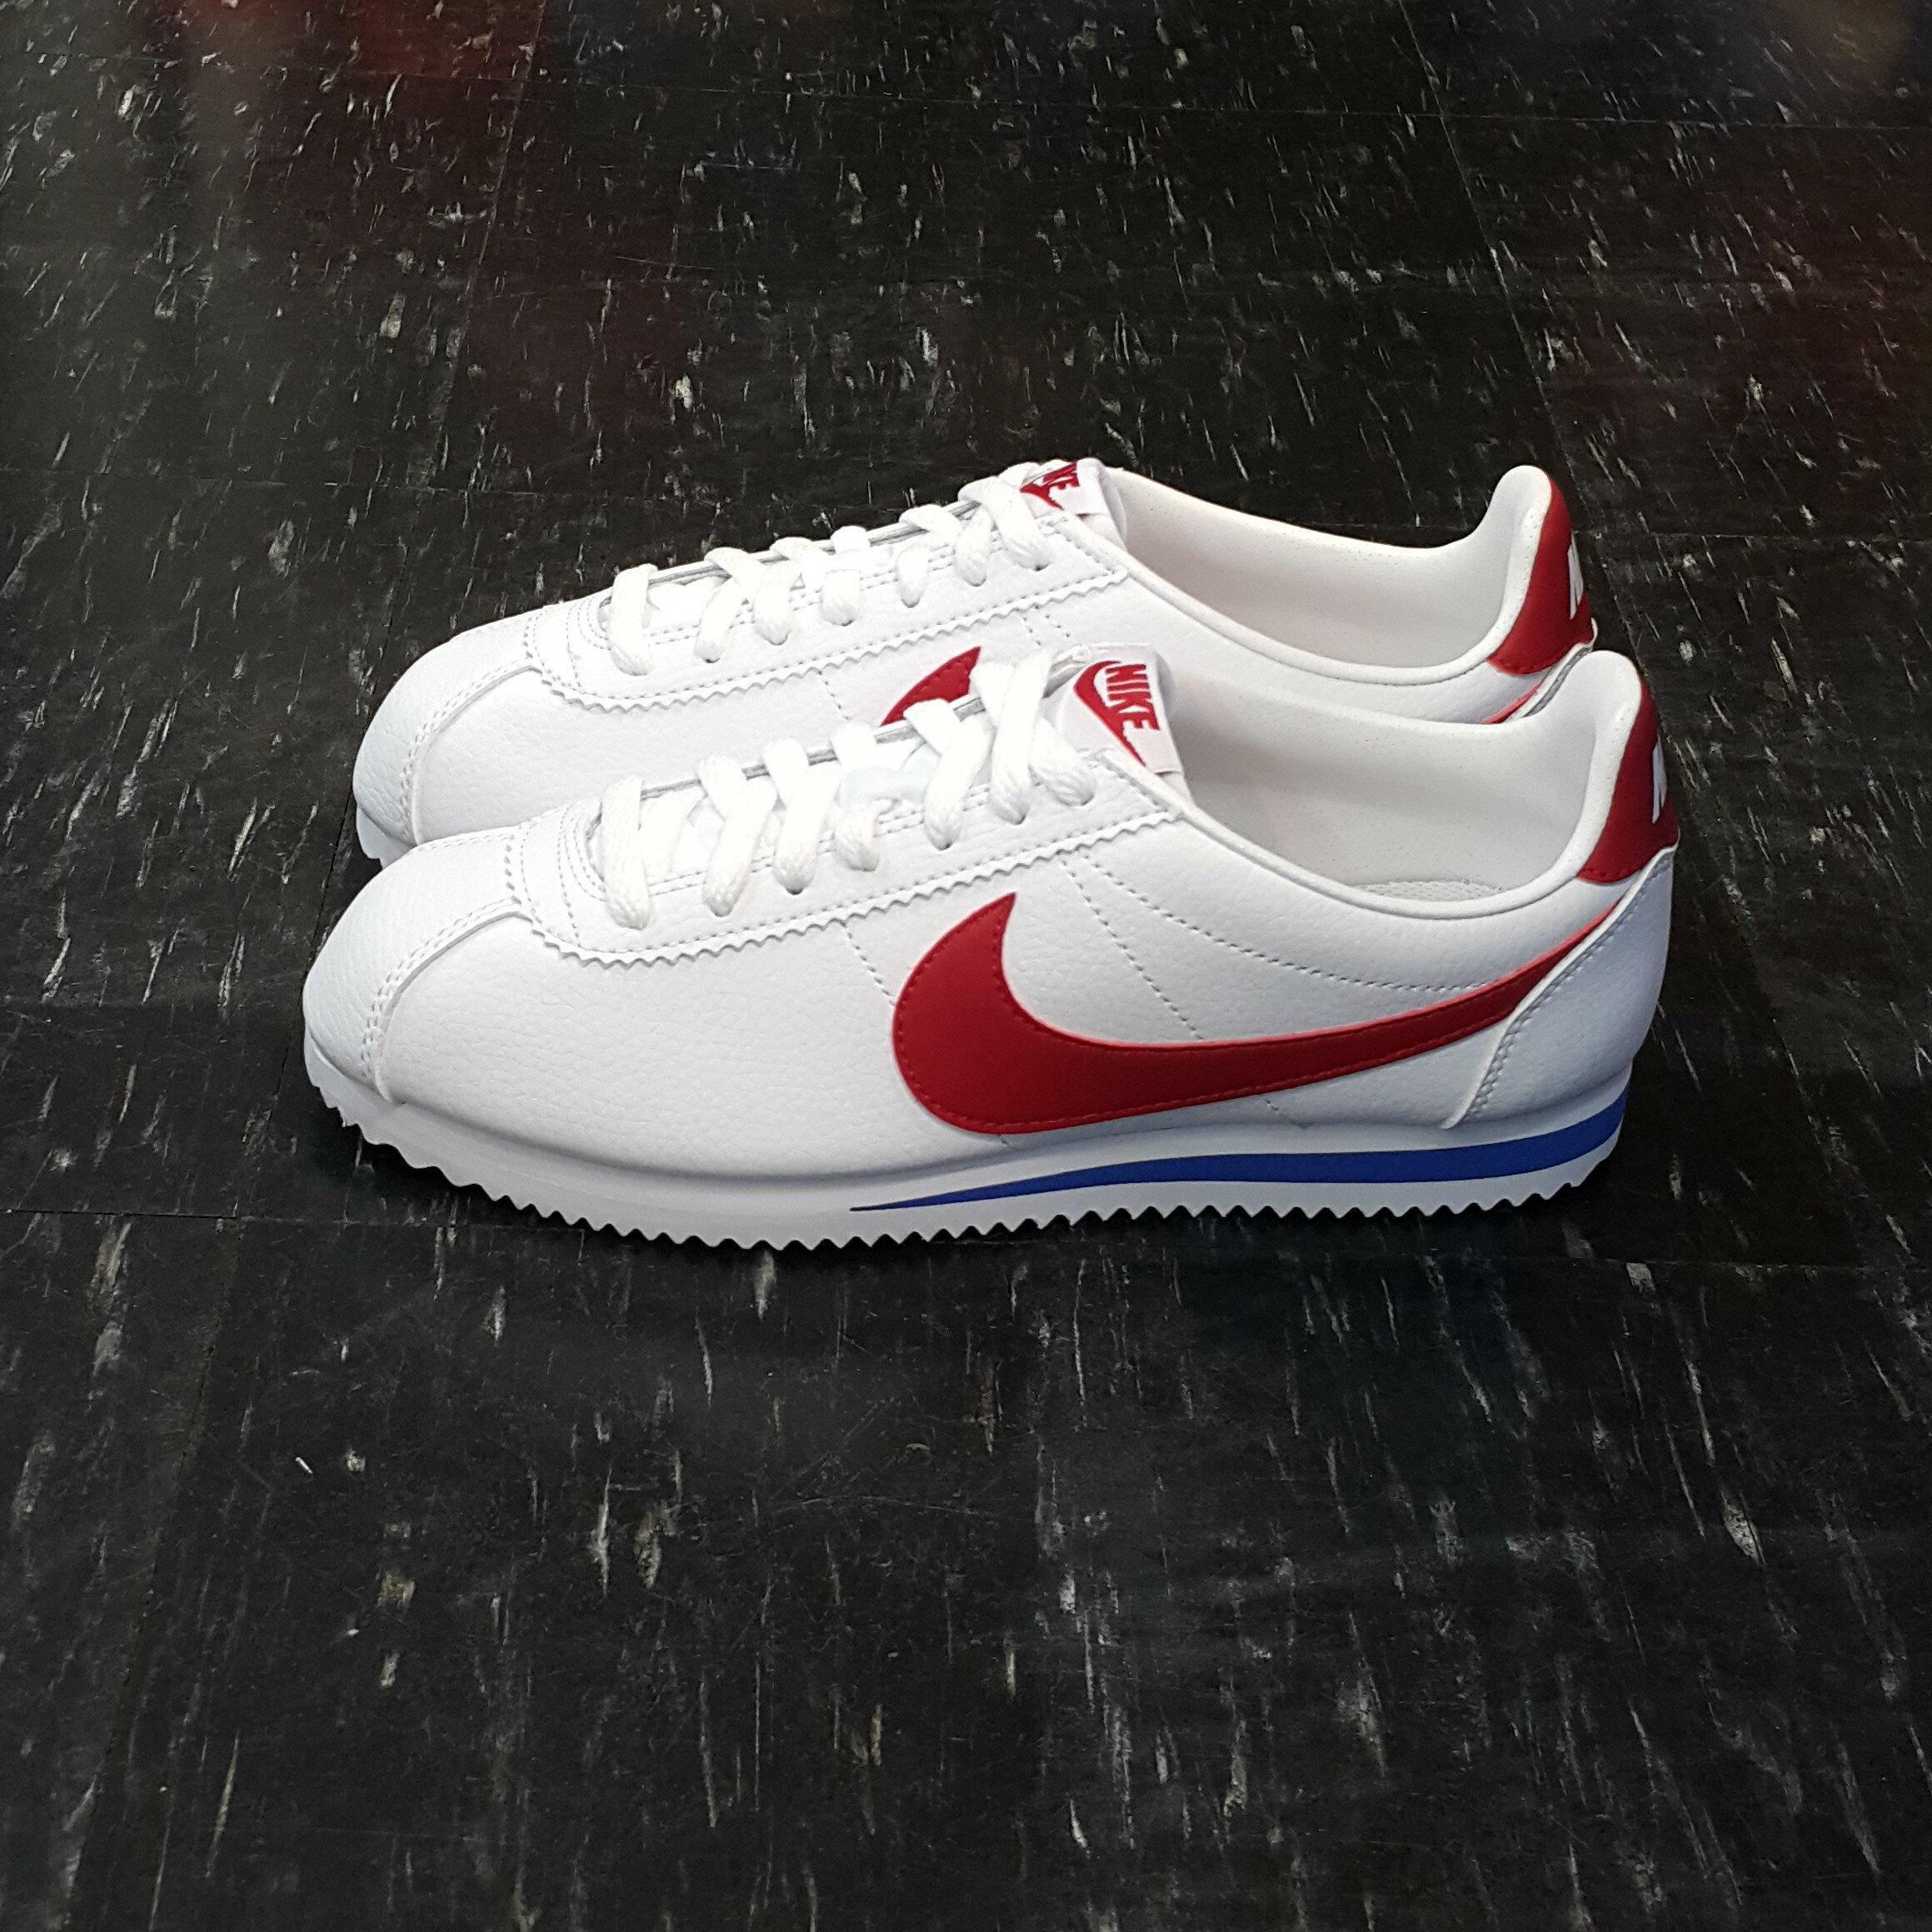 NIKE CLASSIC CORTEZ LEATHER 阿甘鞋 白色 紅色 白紅 紅勾 白紅藍 白底紅勾 皮革 經典 749571-154